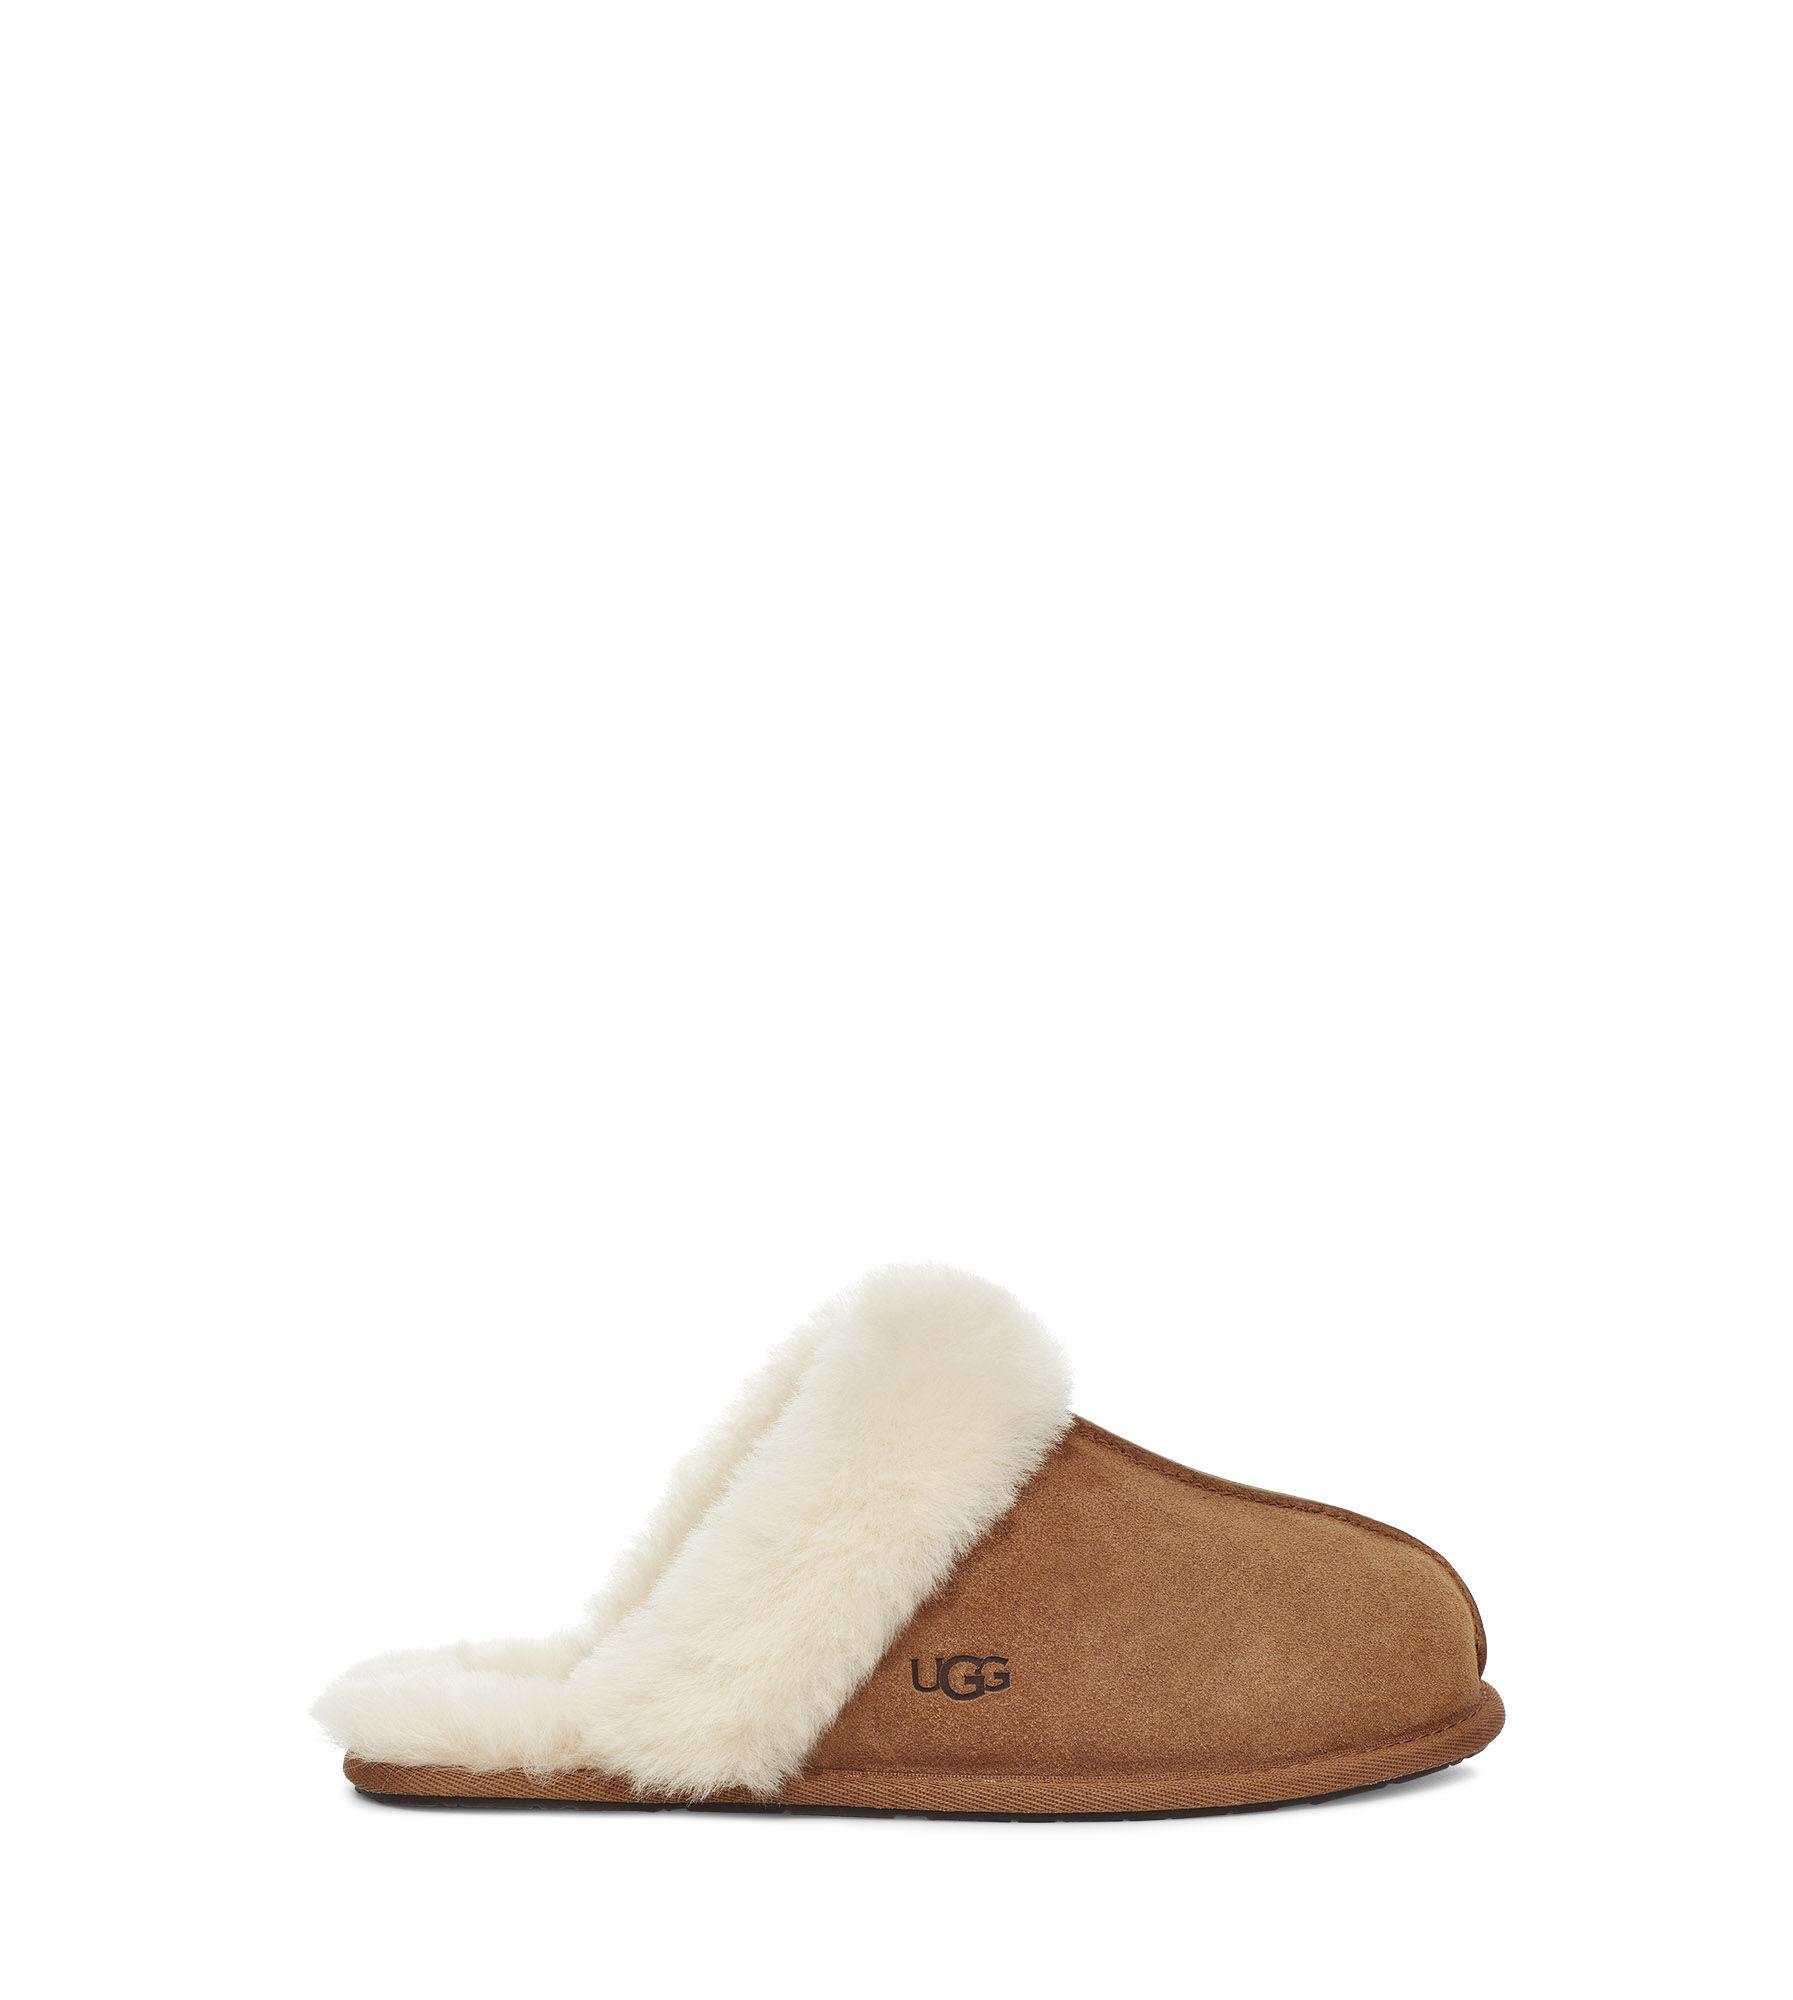 House Shoes \u0026 Home Slippers | UGG